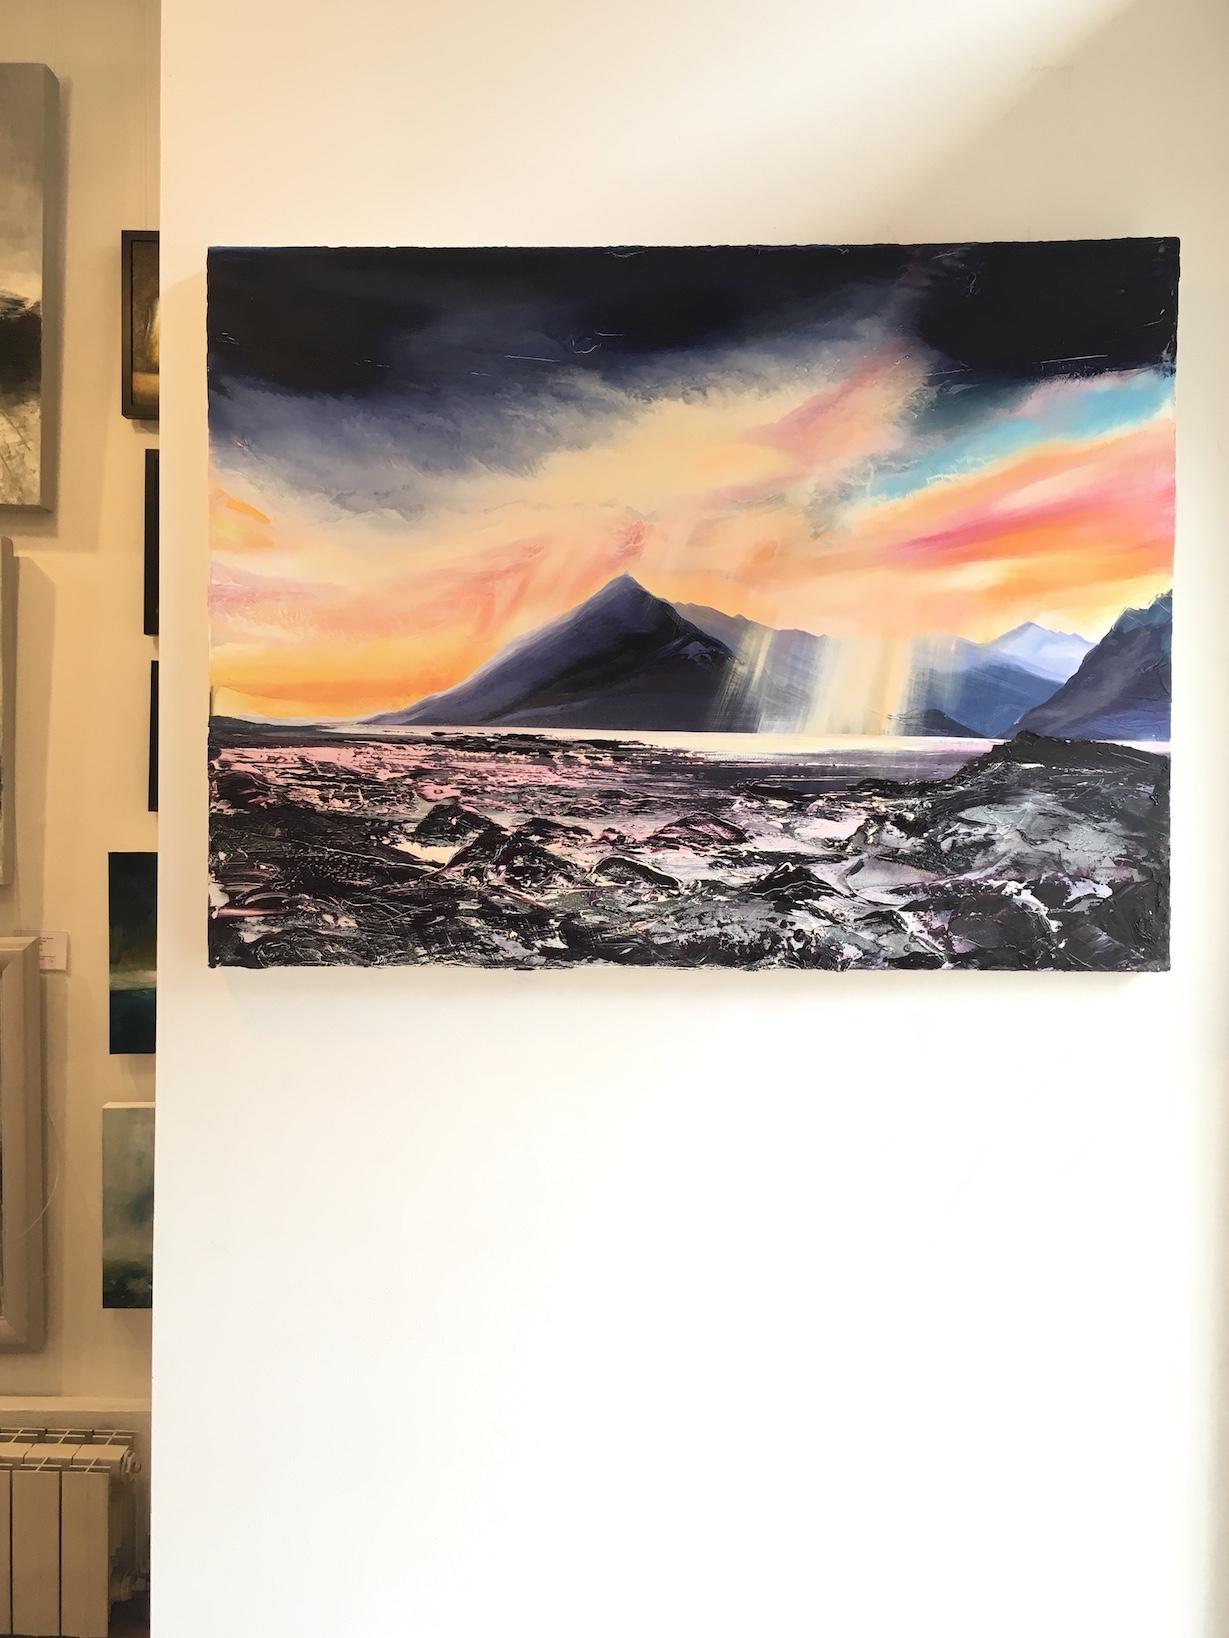 'Sunset Elgol' by artist Shazia Mahmood